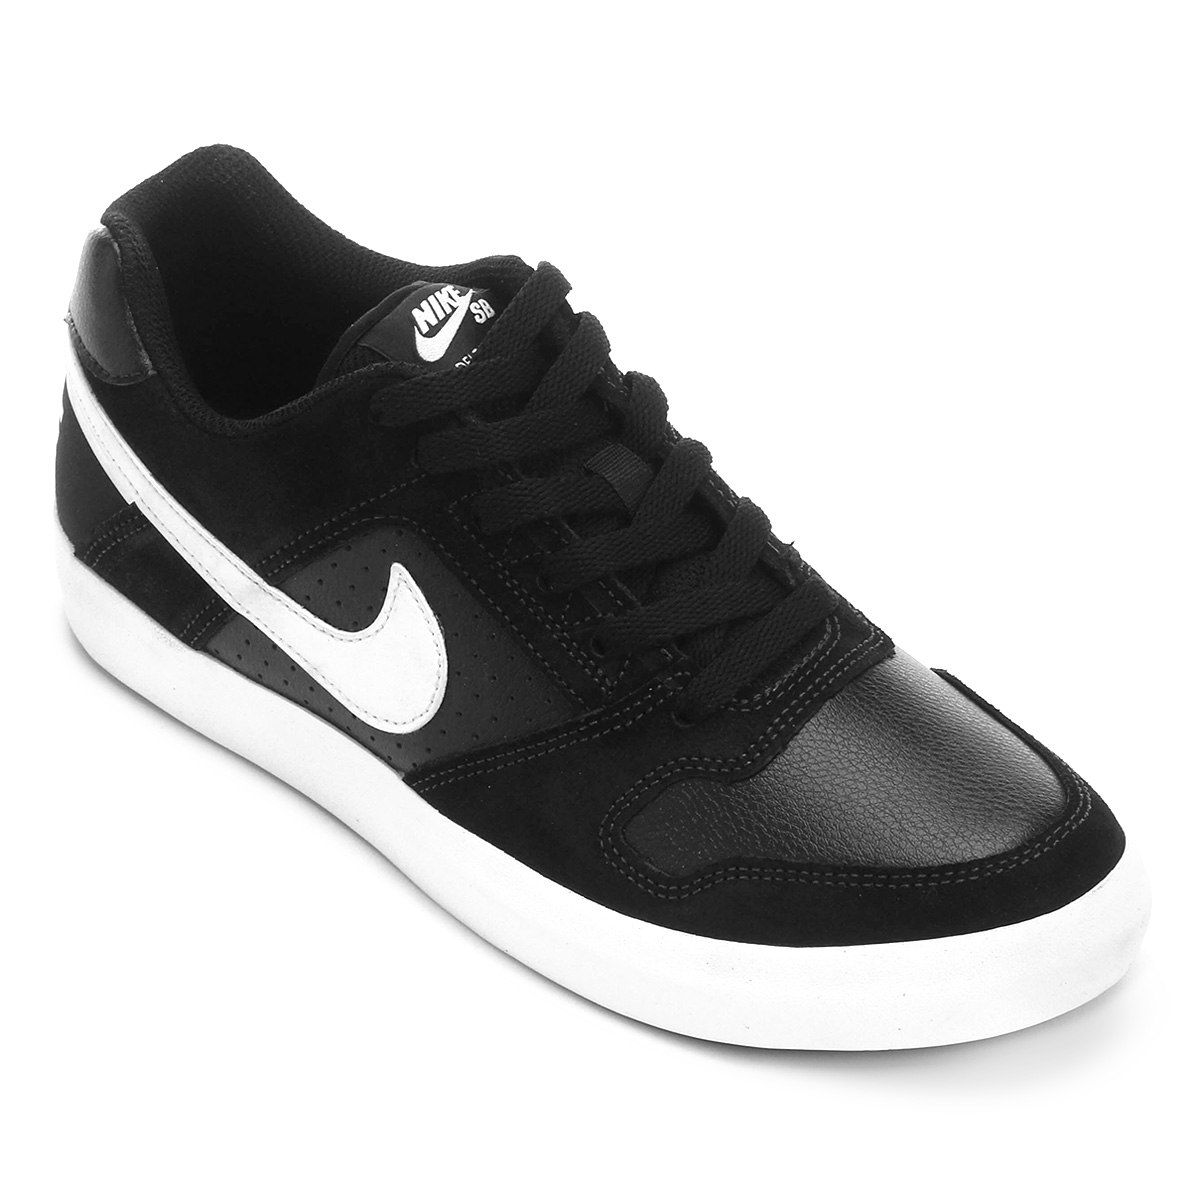 Tênis Nike SB Delta Force Vulc Masculino - Compre Agora   Netshoes ... 04e580b047